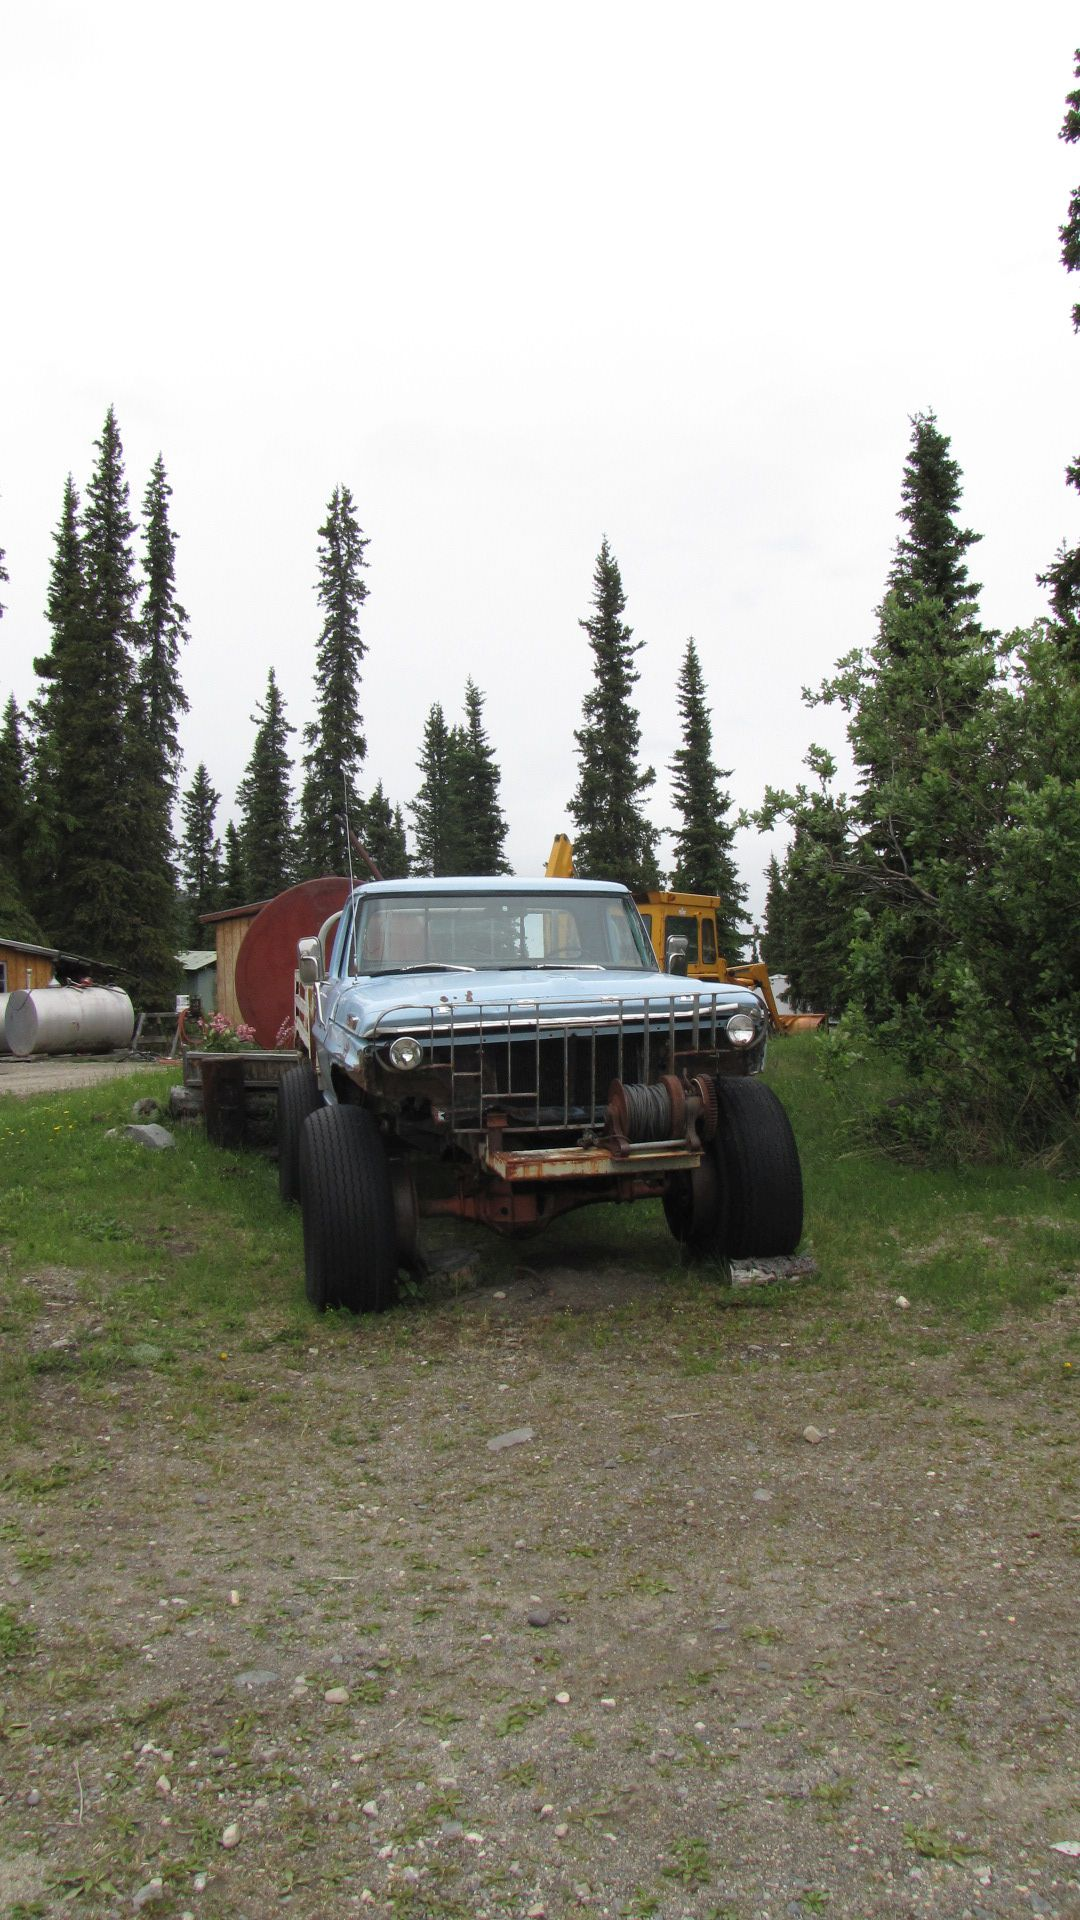 Denali Highway - snow tyres, Alaskan-style